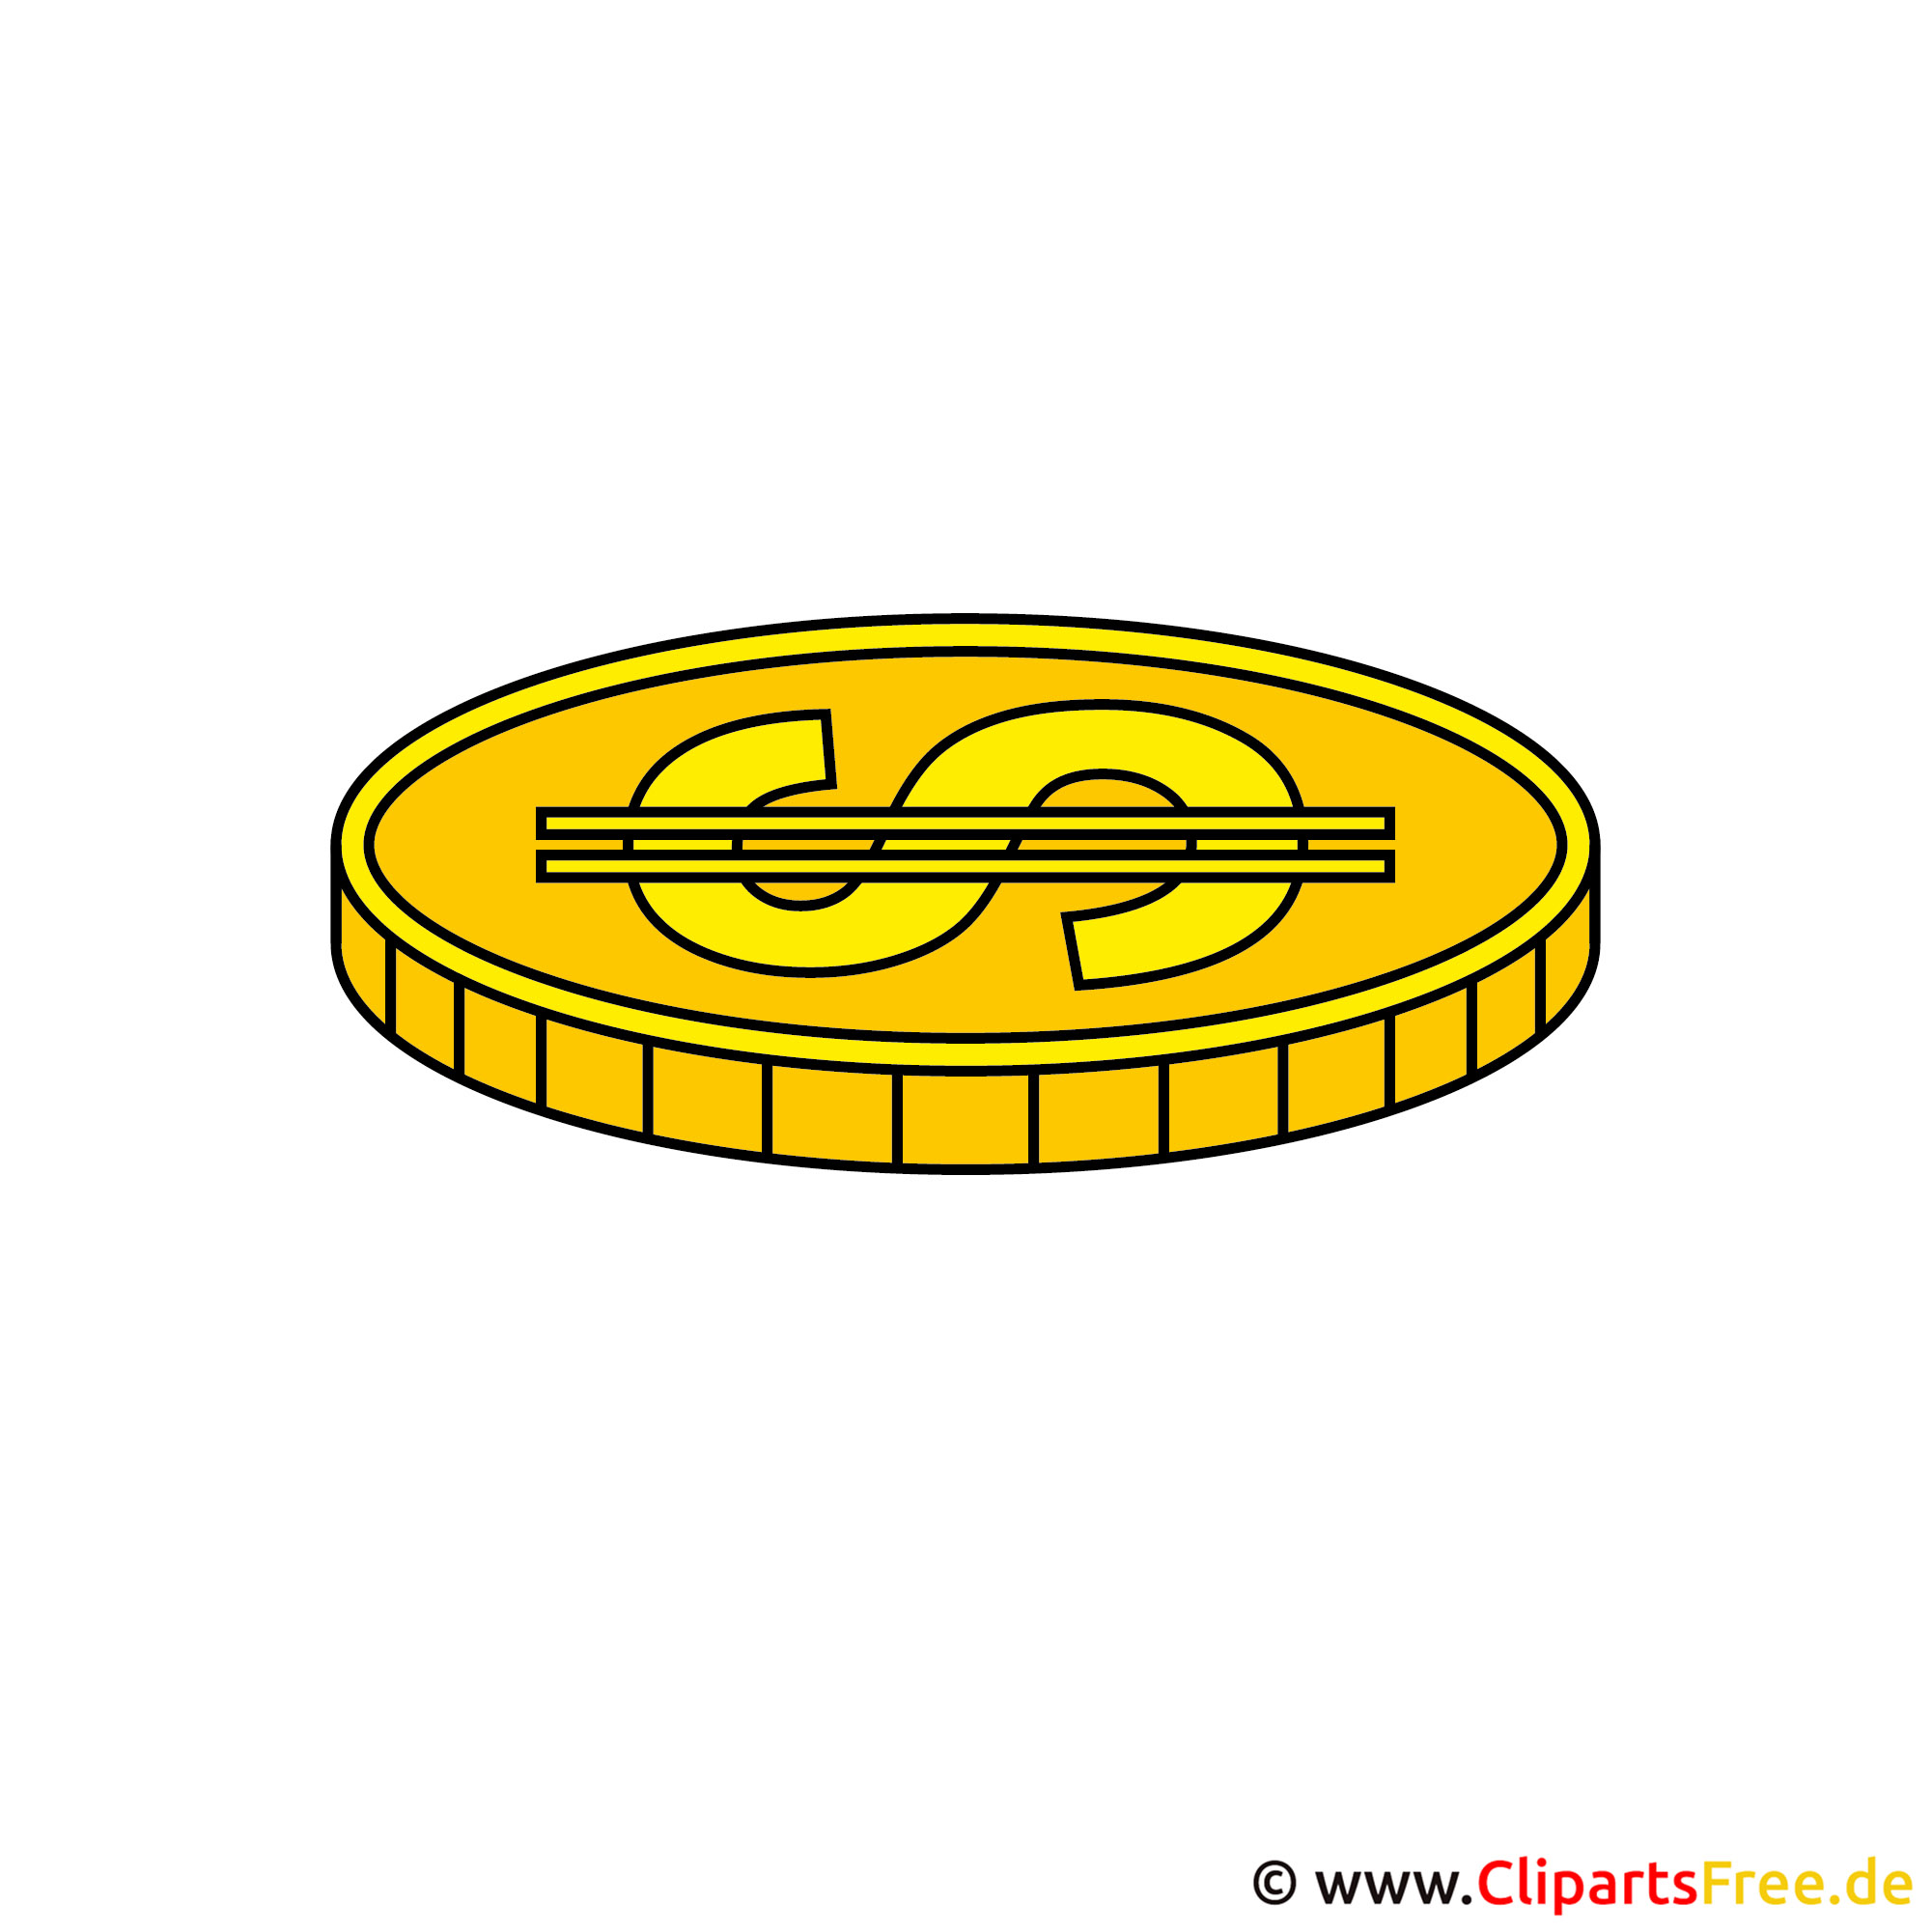 Gold - Muenze Clipart gratis